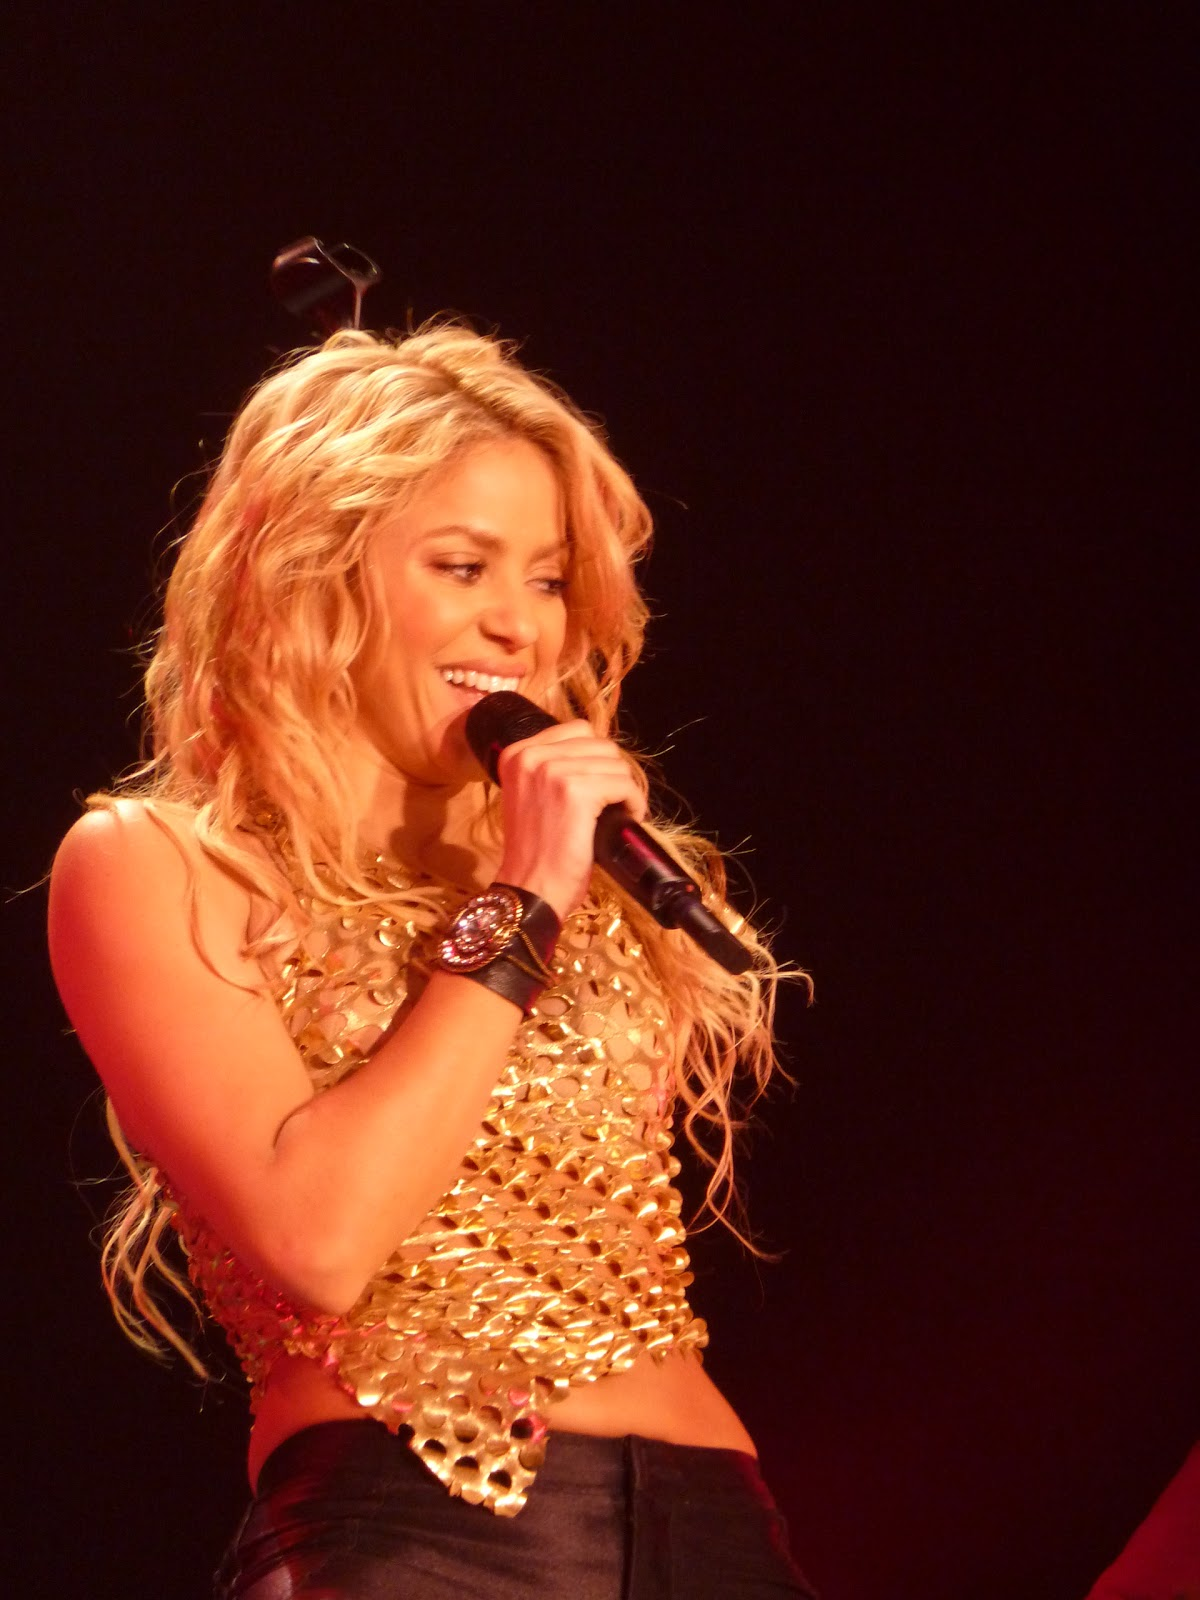 http://2.bp.blogspot.com/-HFw8acwYetU/TiZLHXfu67I/AAAAAAAAAds/pTIJzvoWcdE/s1600/Shakira+-+Loca+2.jpg